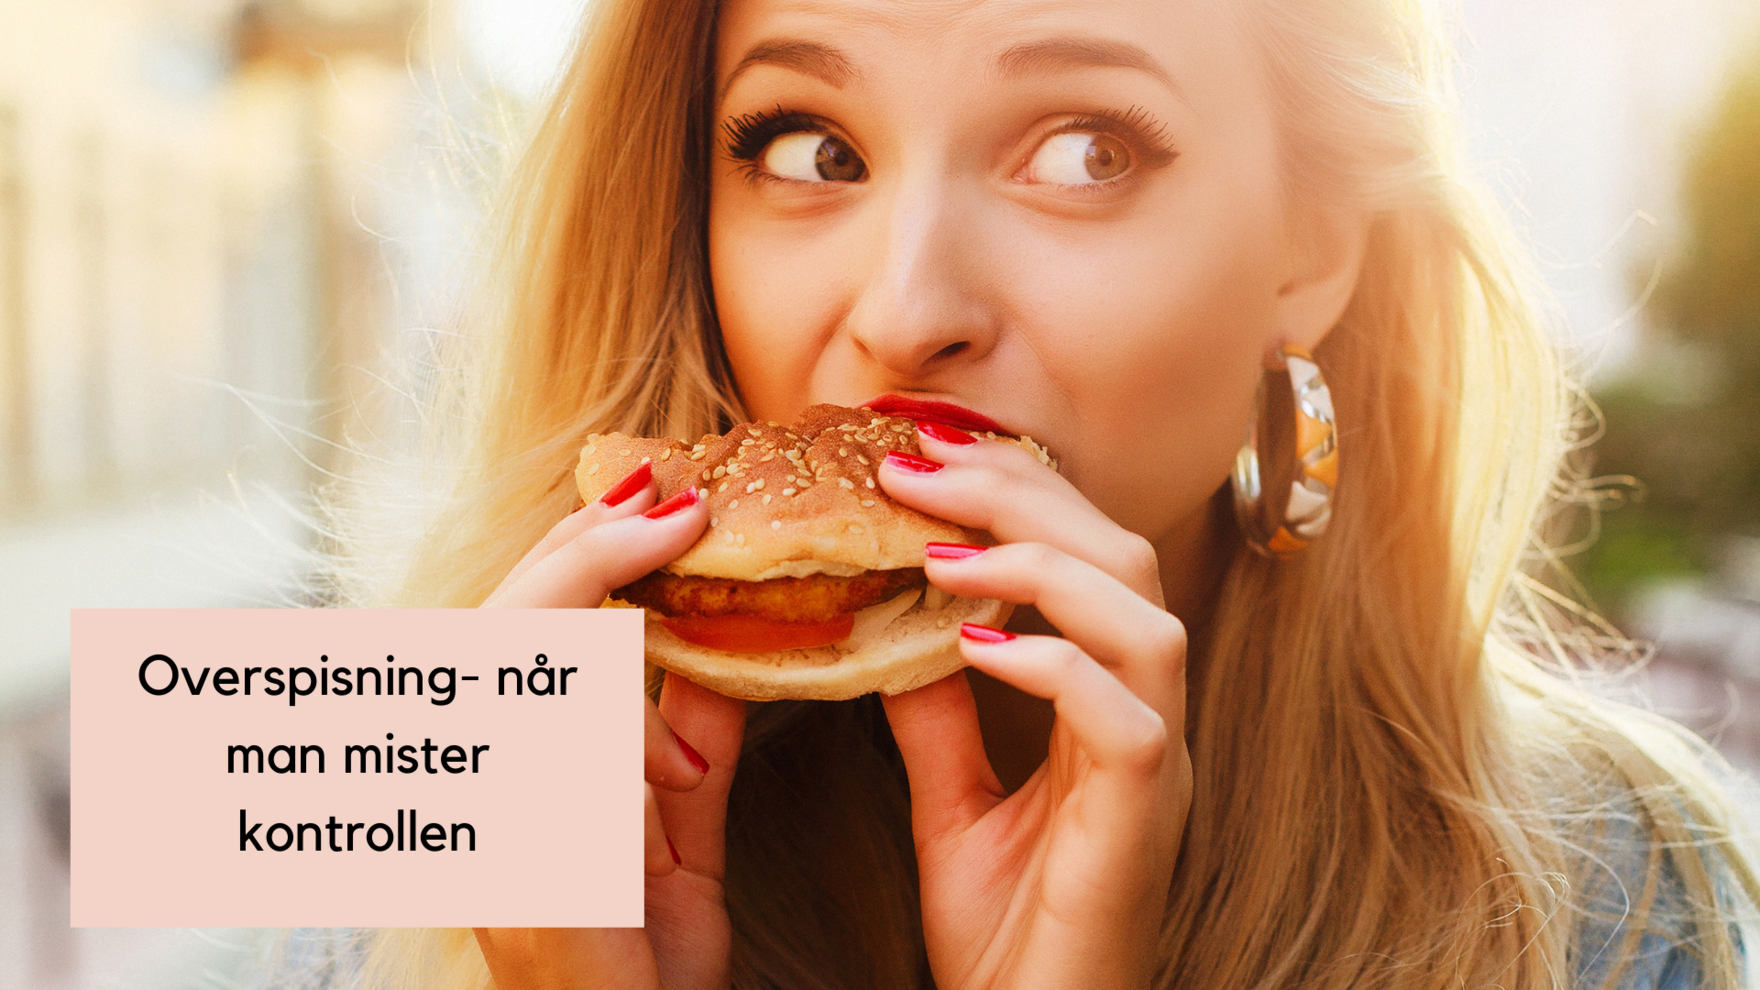 Overspisning- når man mister kontrollen